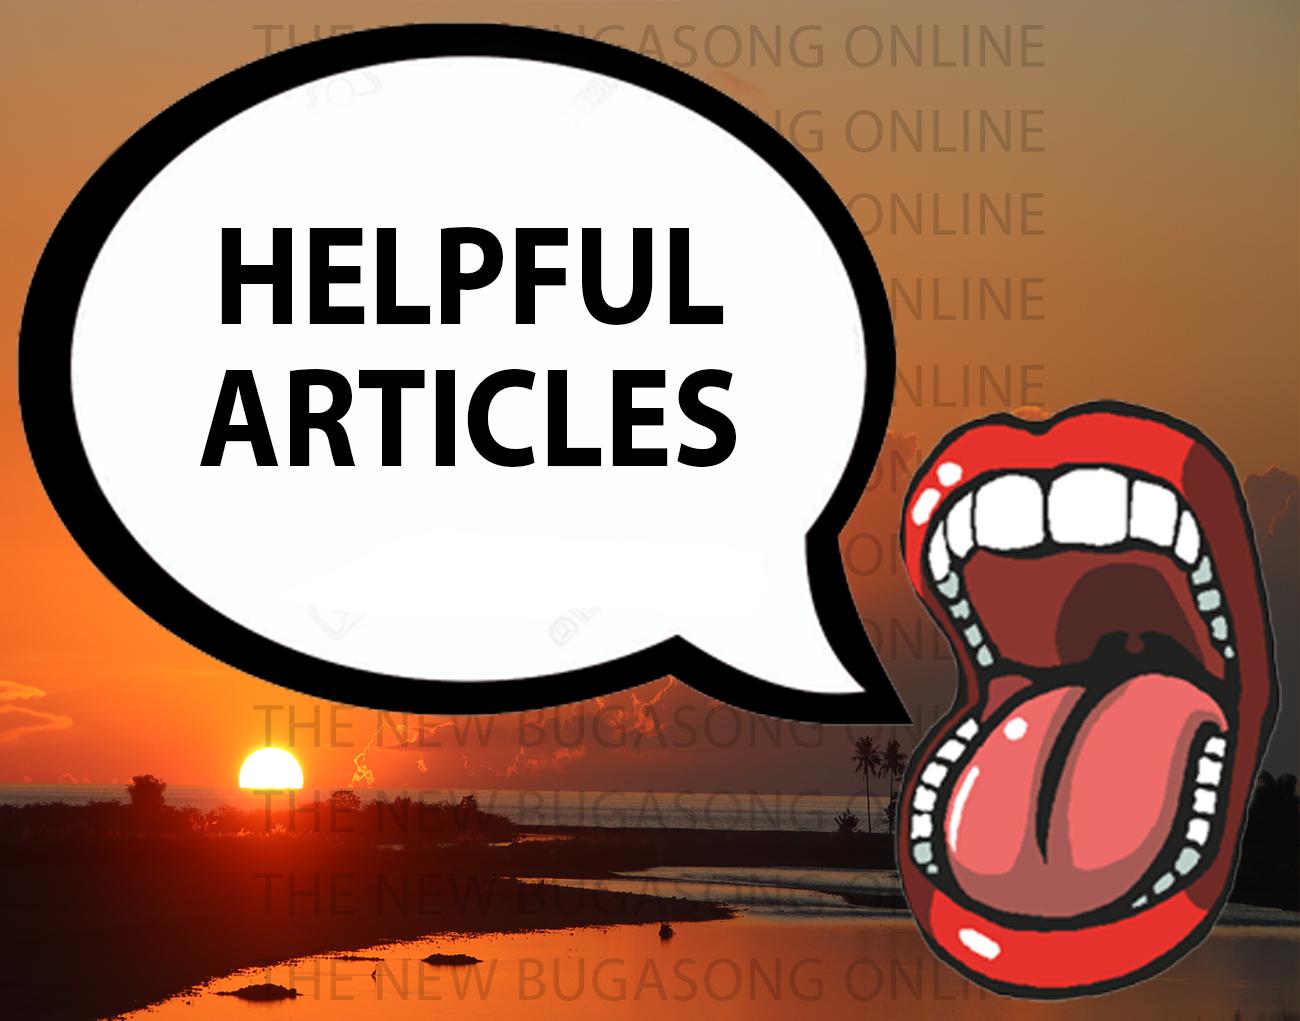 Helpful Articles